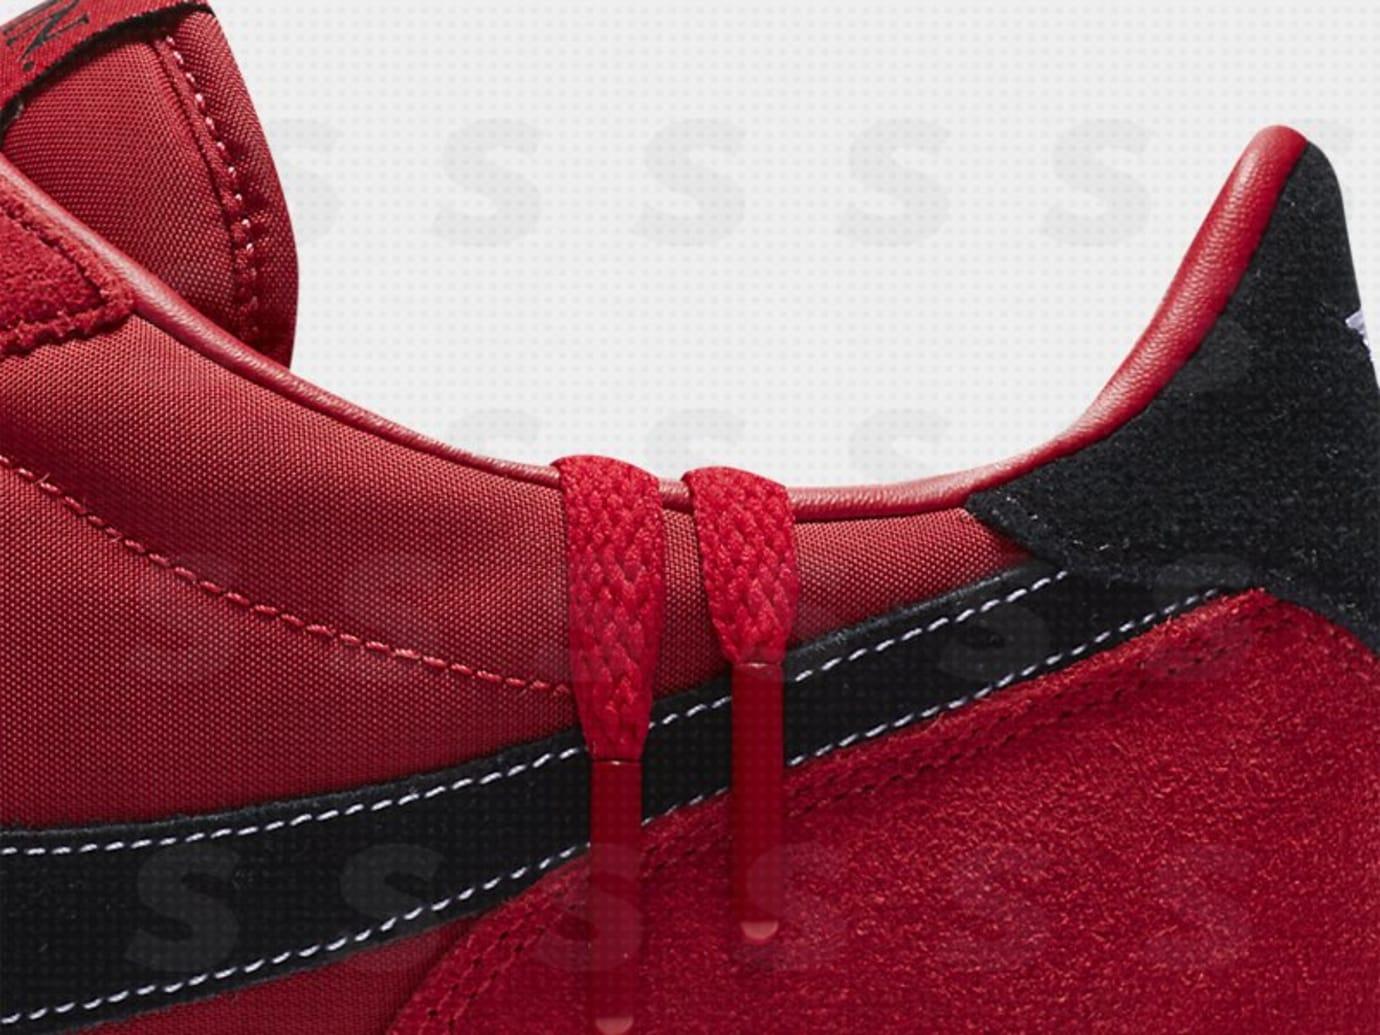 super popular a5732 0216c Kendrick Lamar Nike Cortez Damn | Sole Collector